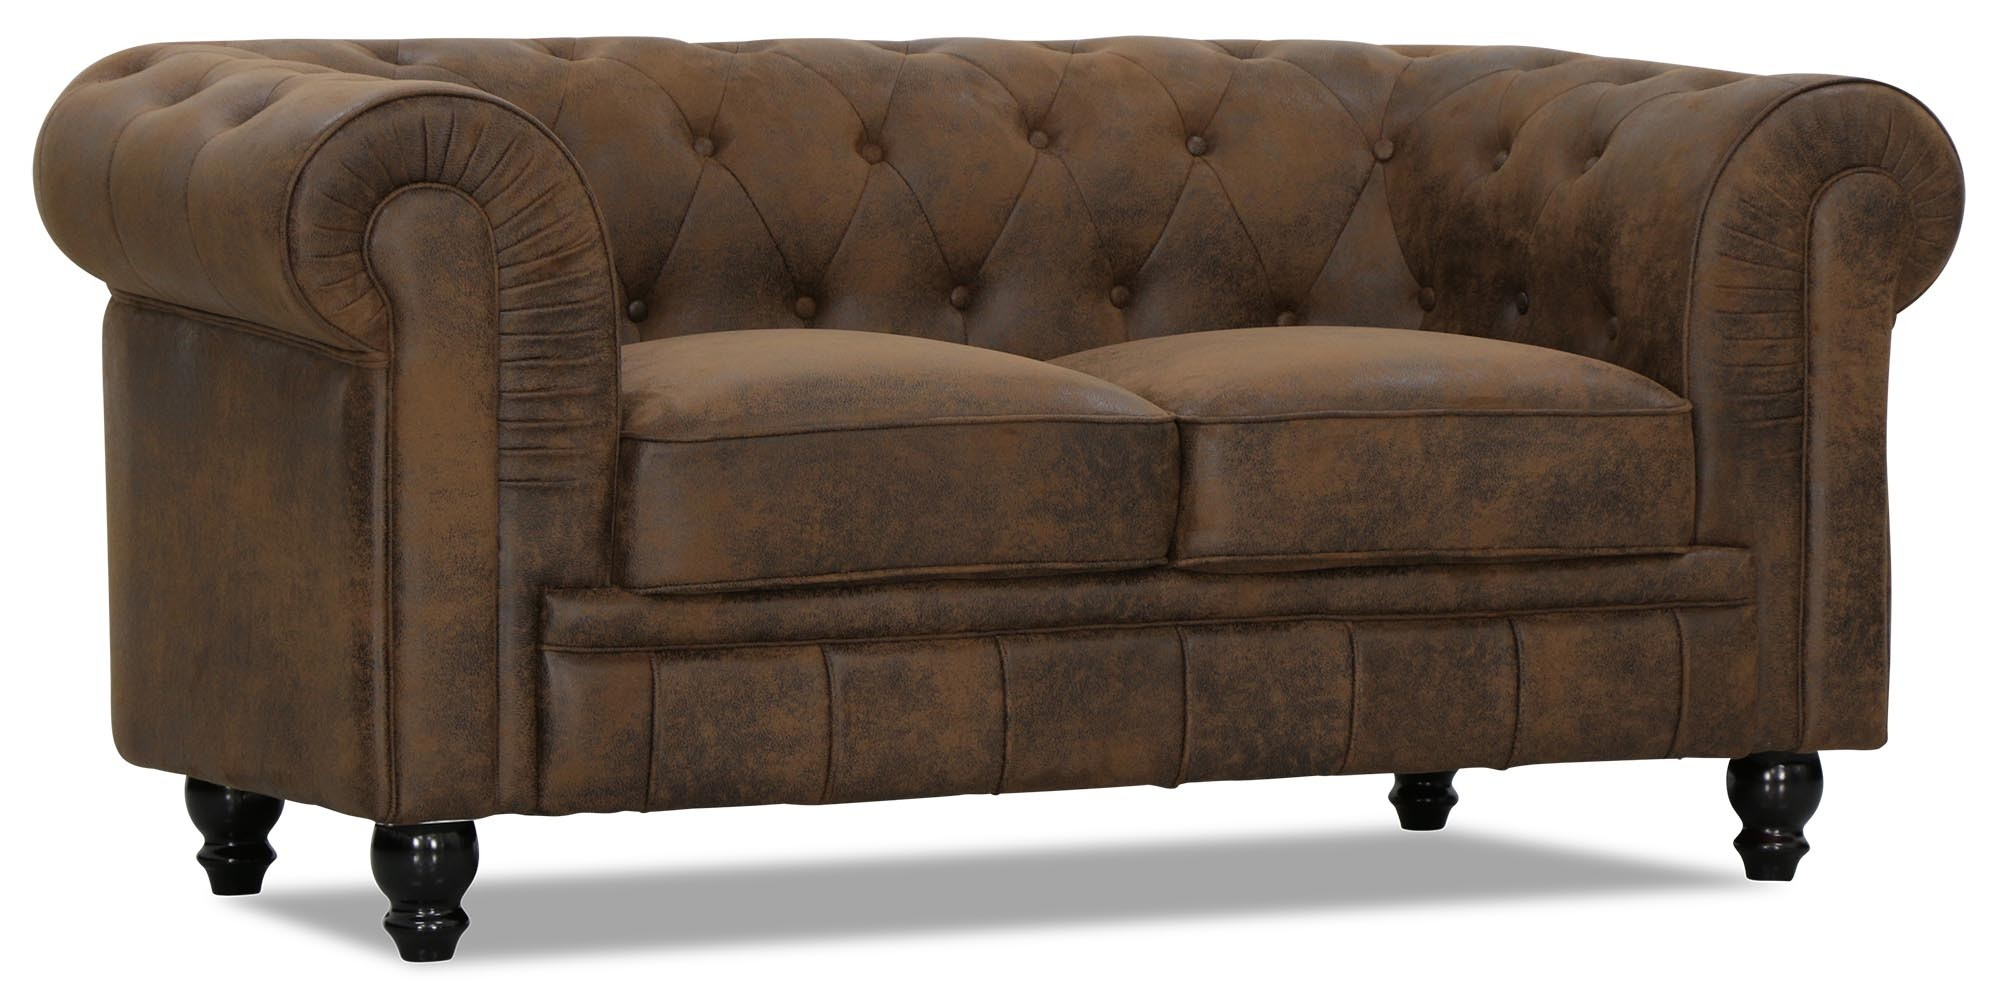 Pu Leather Sofa 133 Customer Reviews